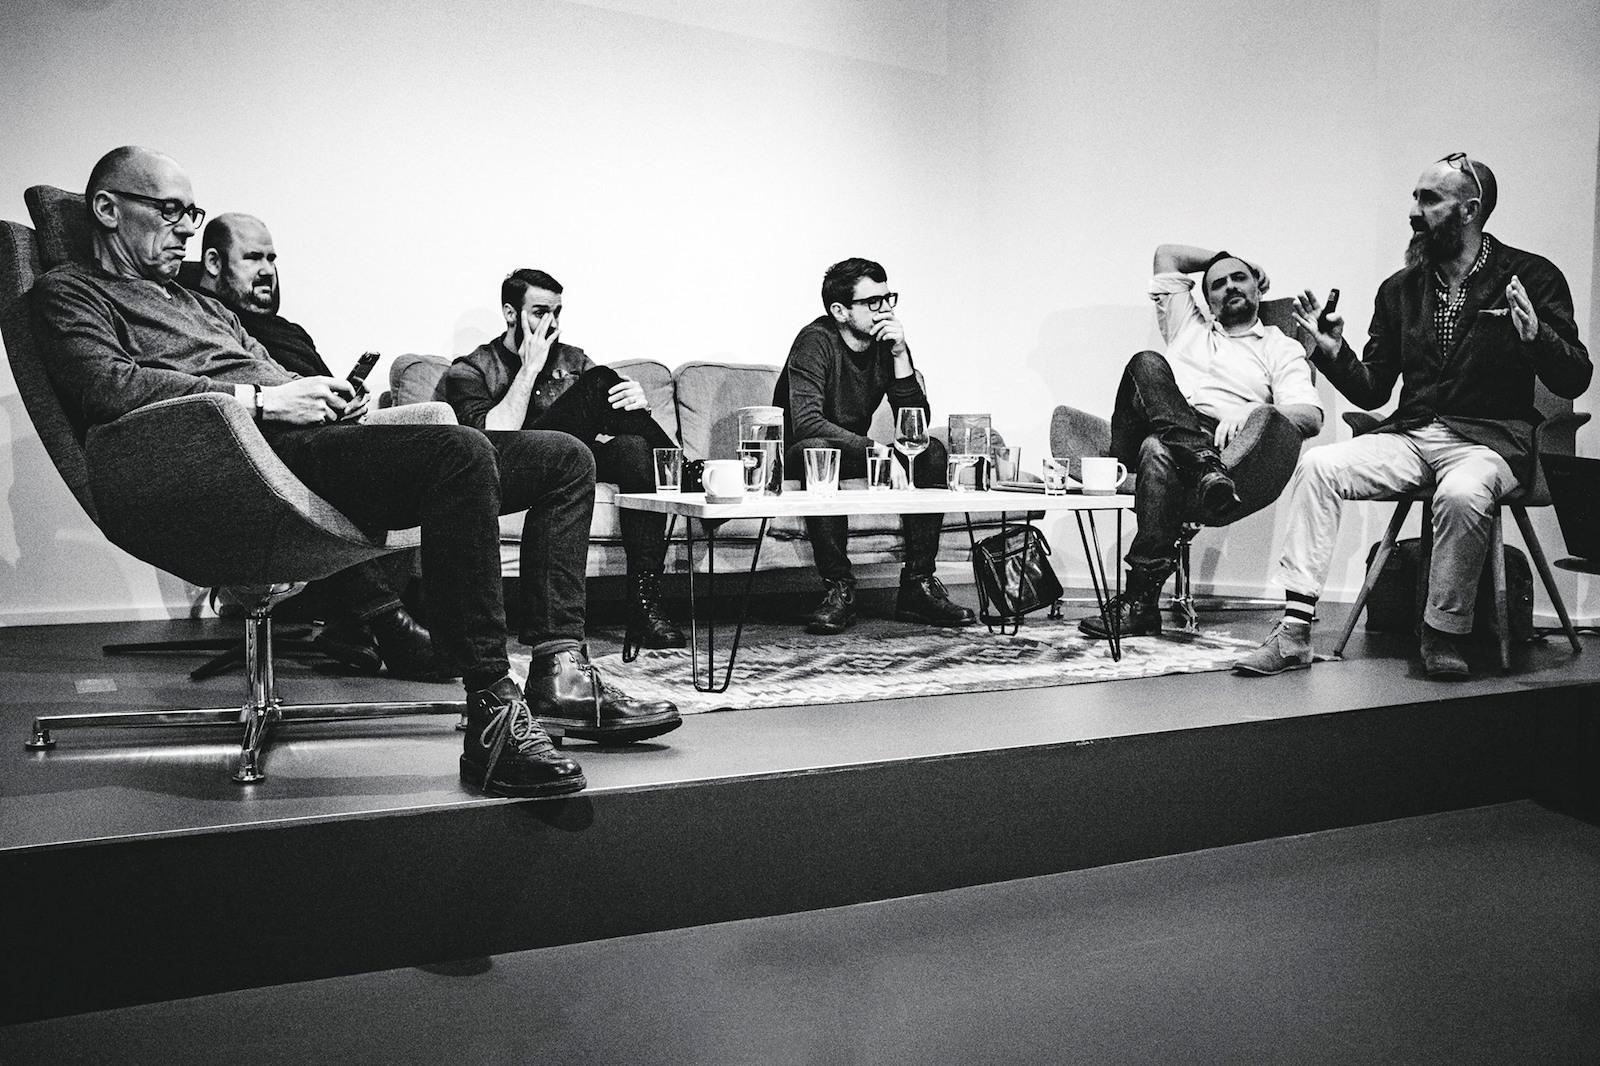 Zleva Josef Havelka, Lumír Kajnar, Jan Juza, David Zábranský, Tomáš Rektor, Tomáš Hrivnák. Foto: Adam Hrubý